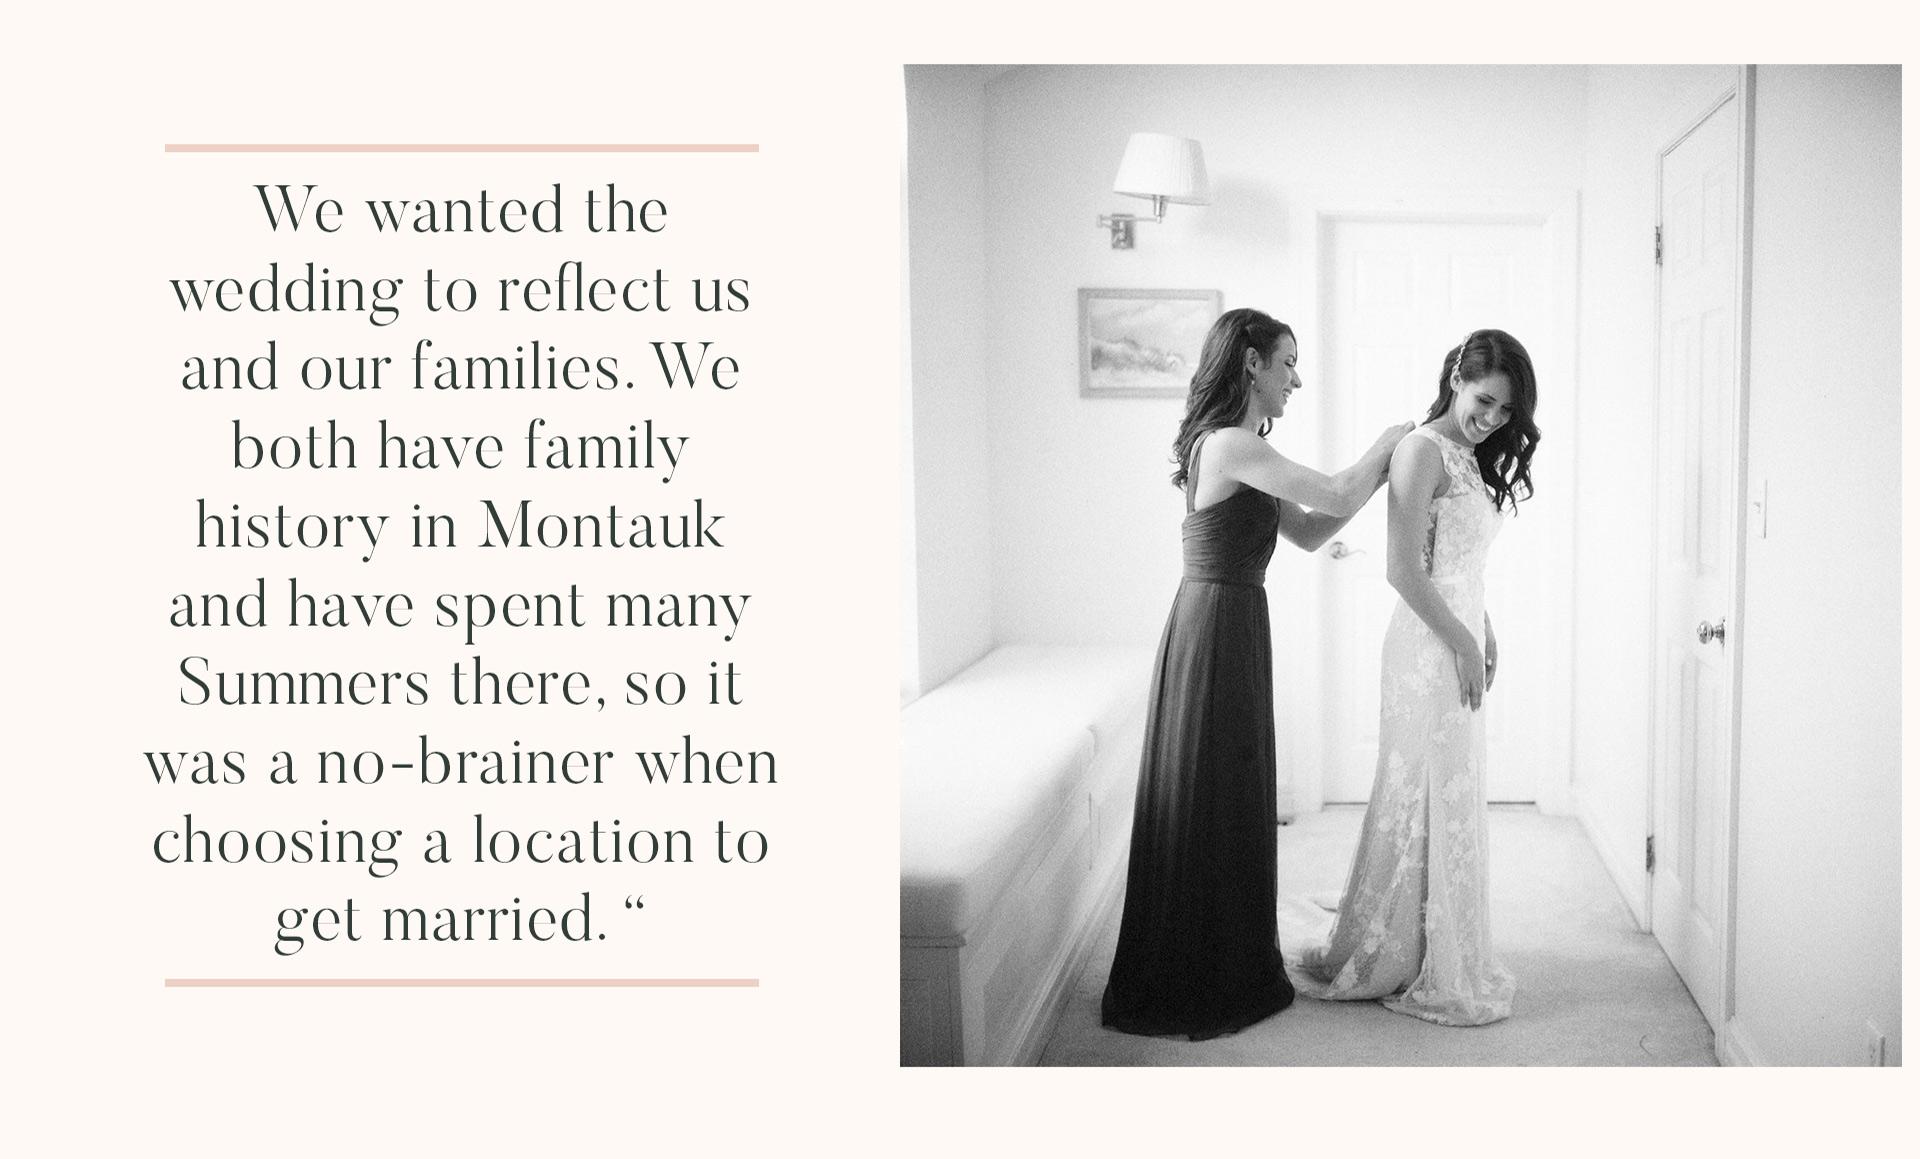 02 montauk wedding photographer - GURNEYS WEDDING - MONTAUK, NY